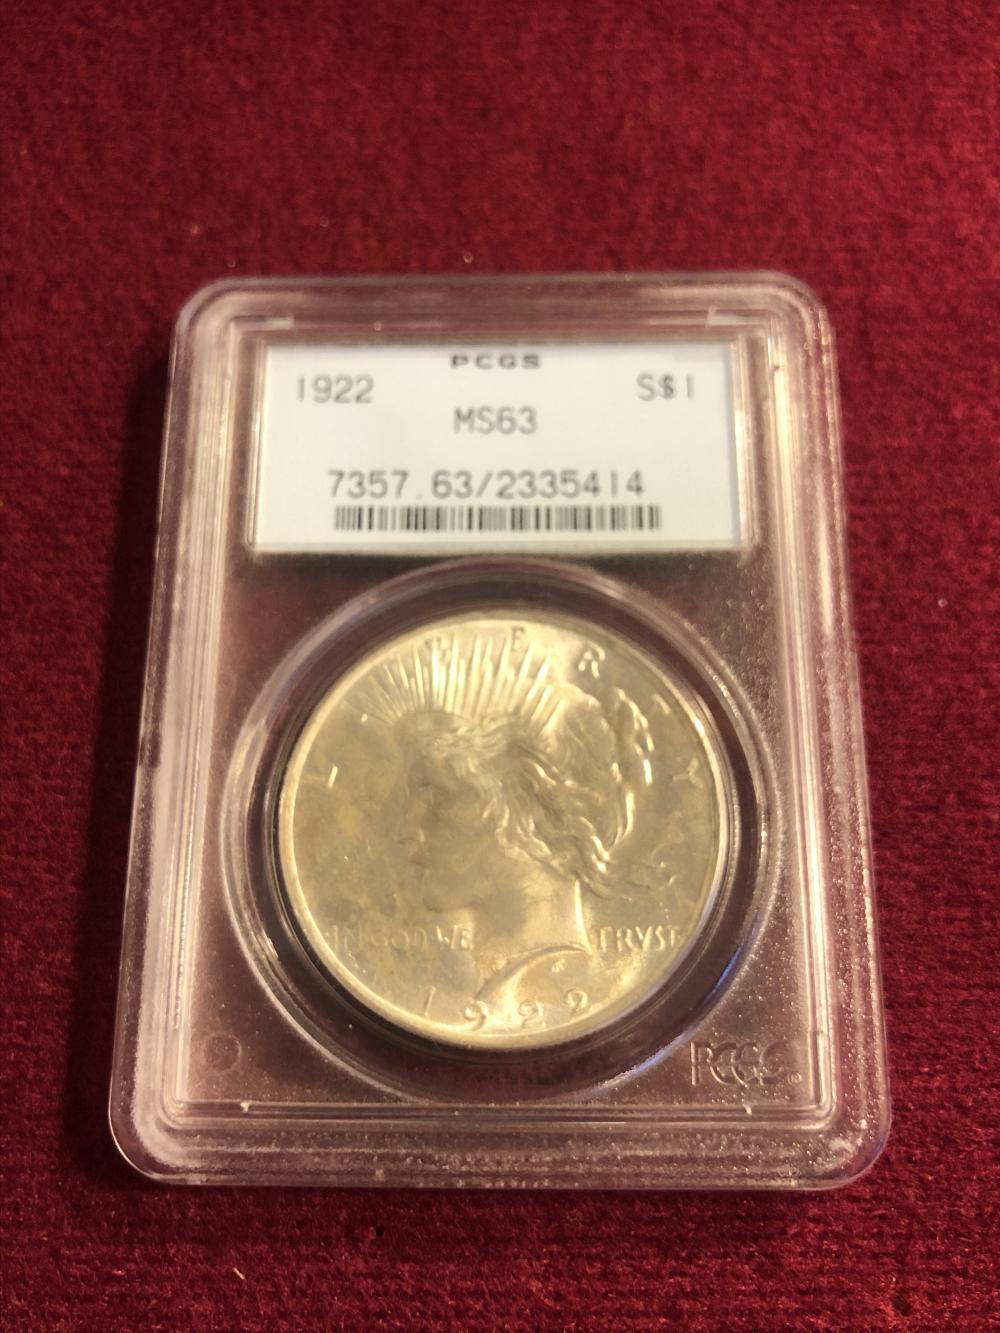 Graded 1922 peace silver dollar